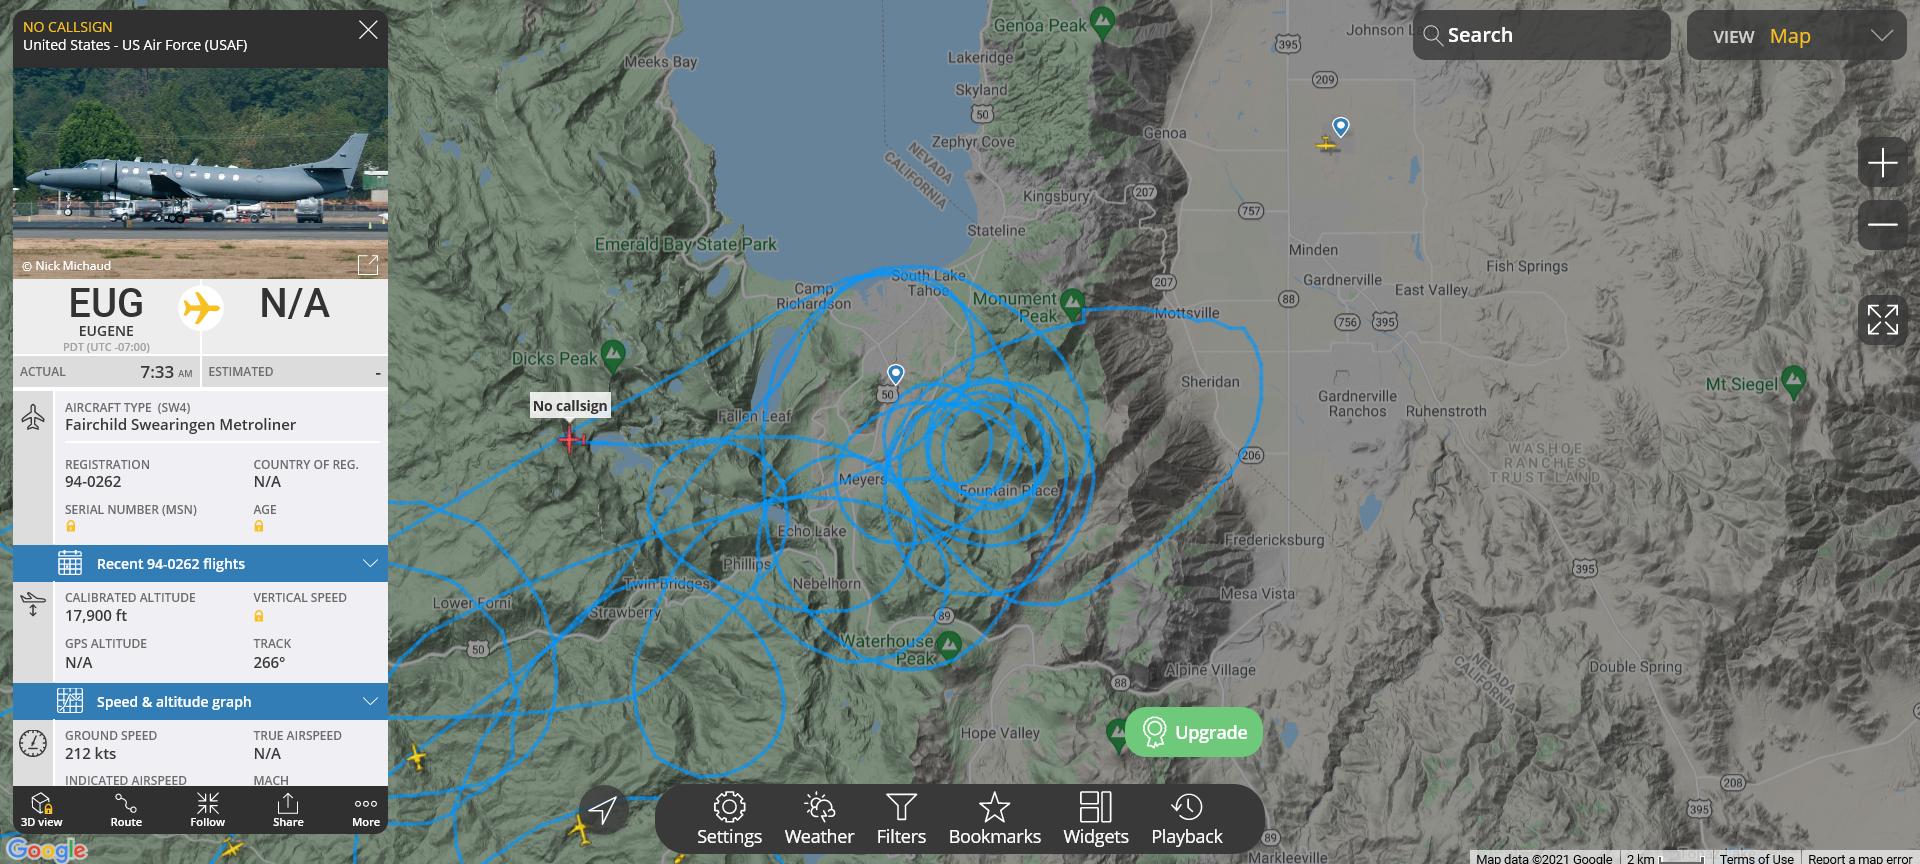 Screenshot 2021-08-31 at 11-07-19 Live Flight Tracker - Real-Time Flight Tracker Map Flightrad...png